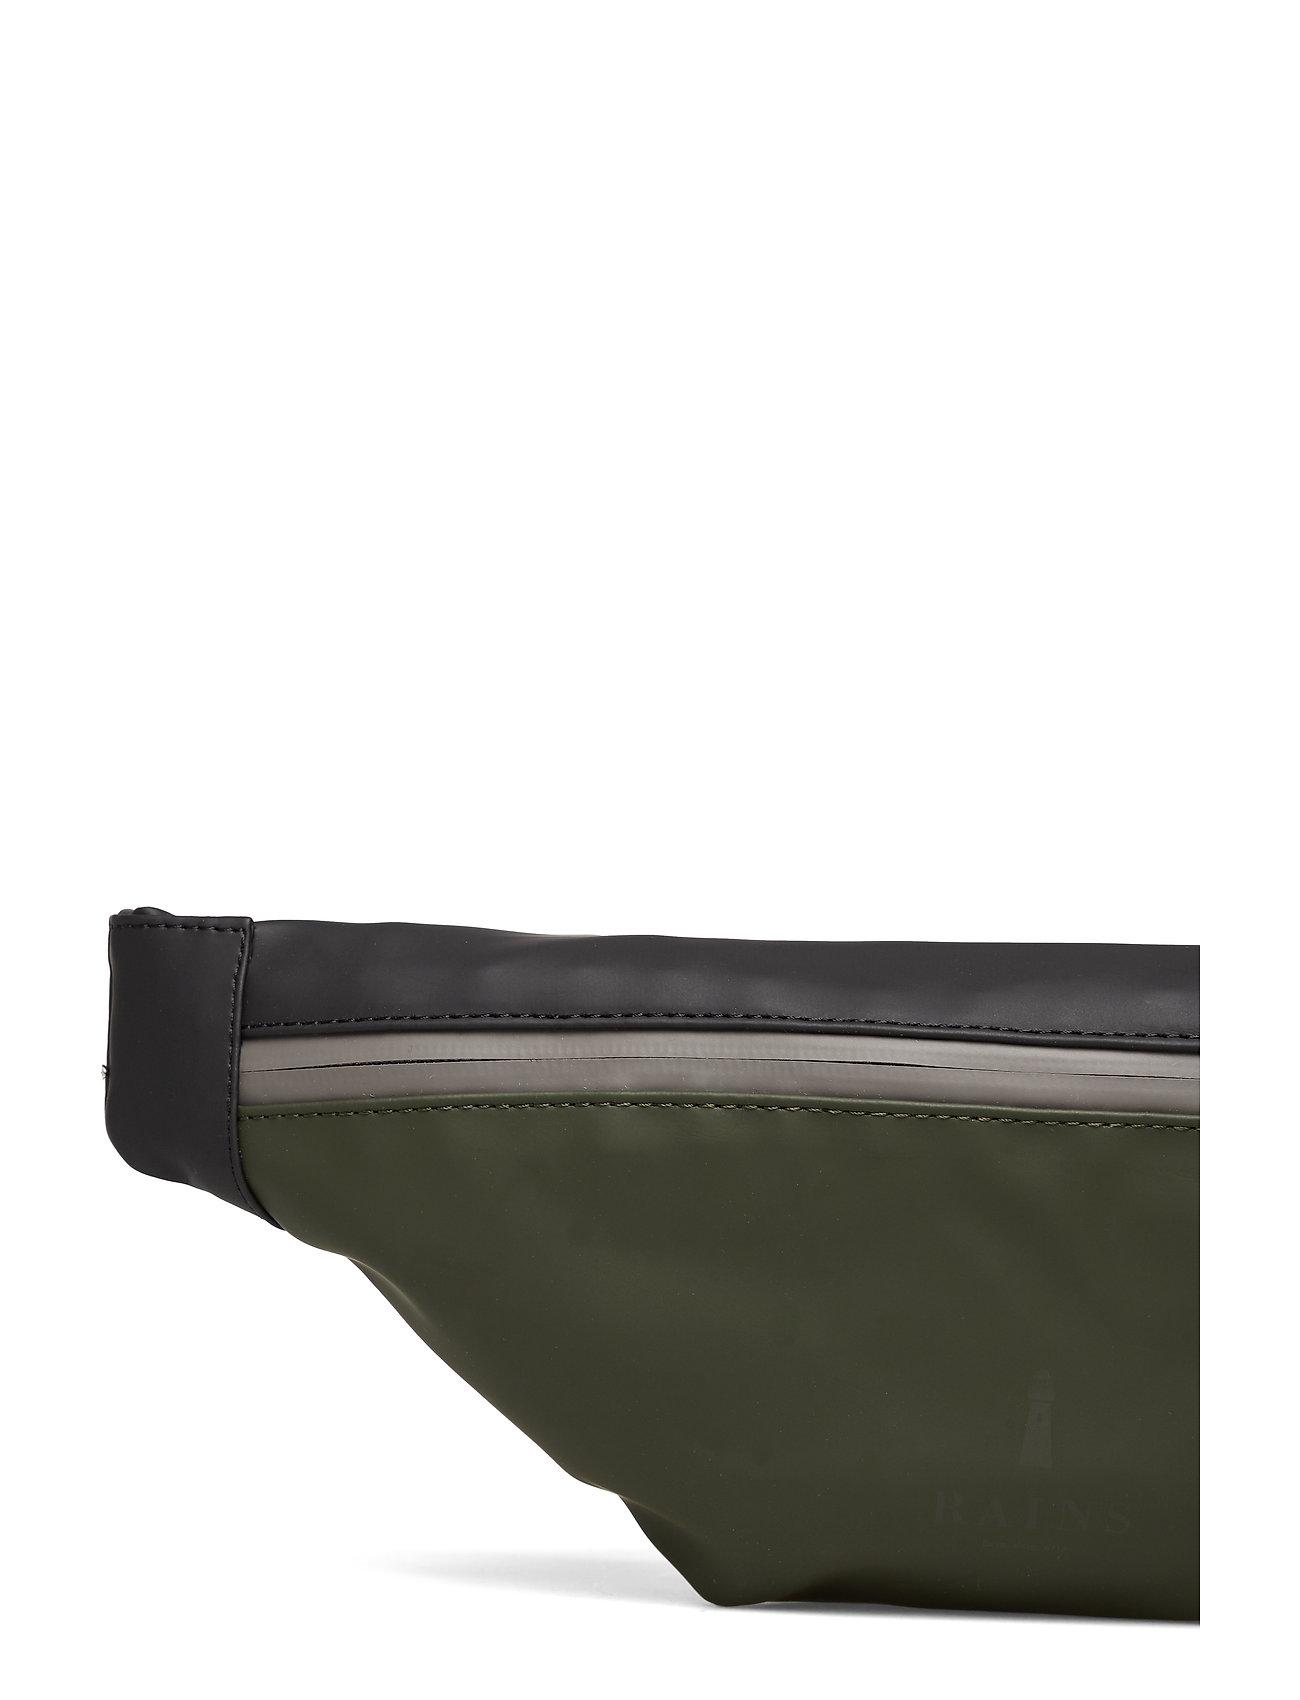 Color Block Bum blackRains Bag Minigreen fgYmb7yI6v